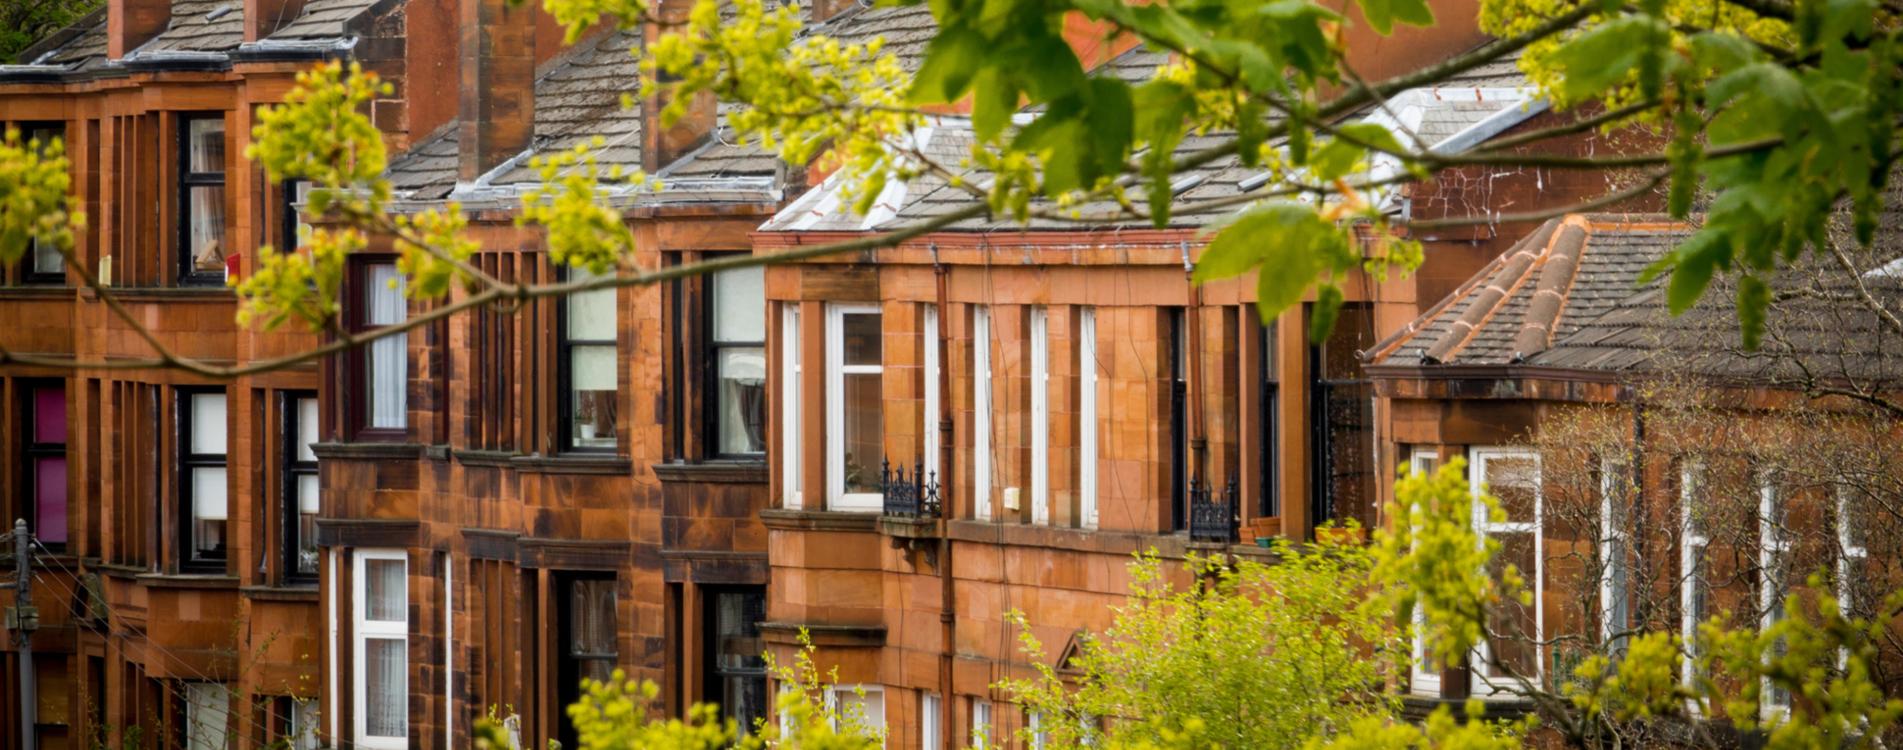 Property Factor Glasgow